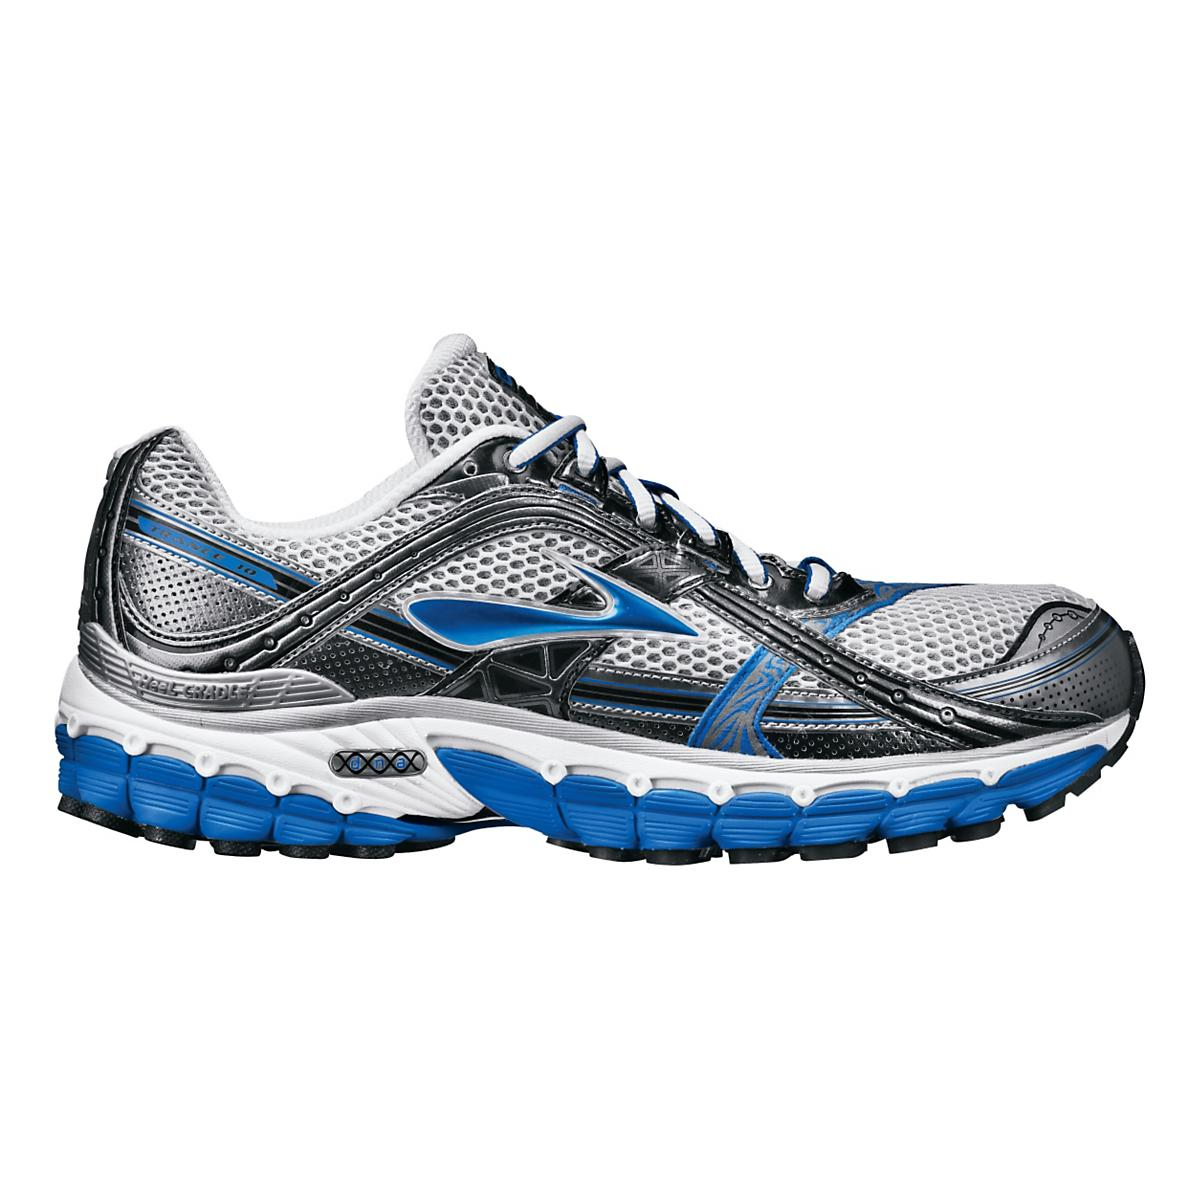 27ce52fe2d4 Mens Brooks Trance 10 Running Shoe at Road Runner Sports